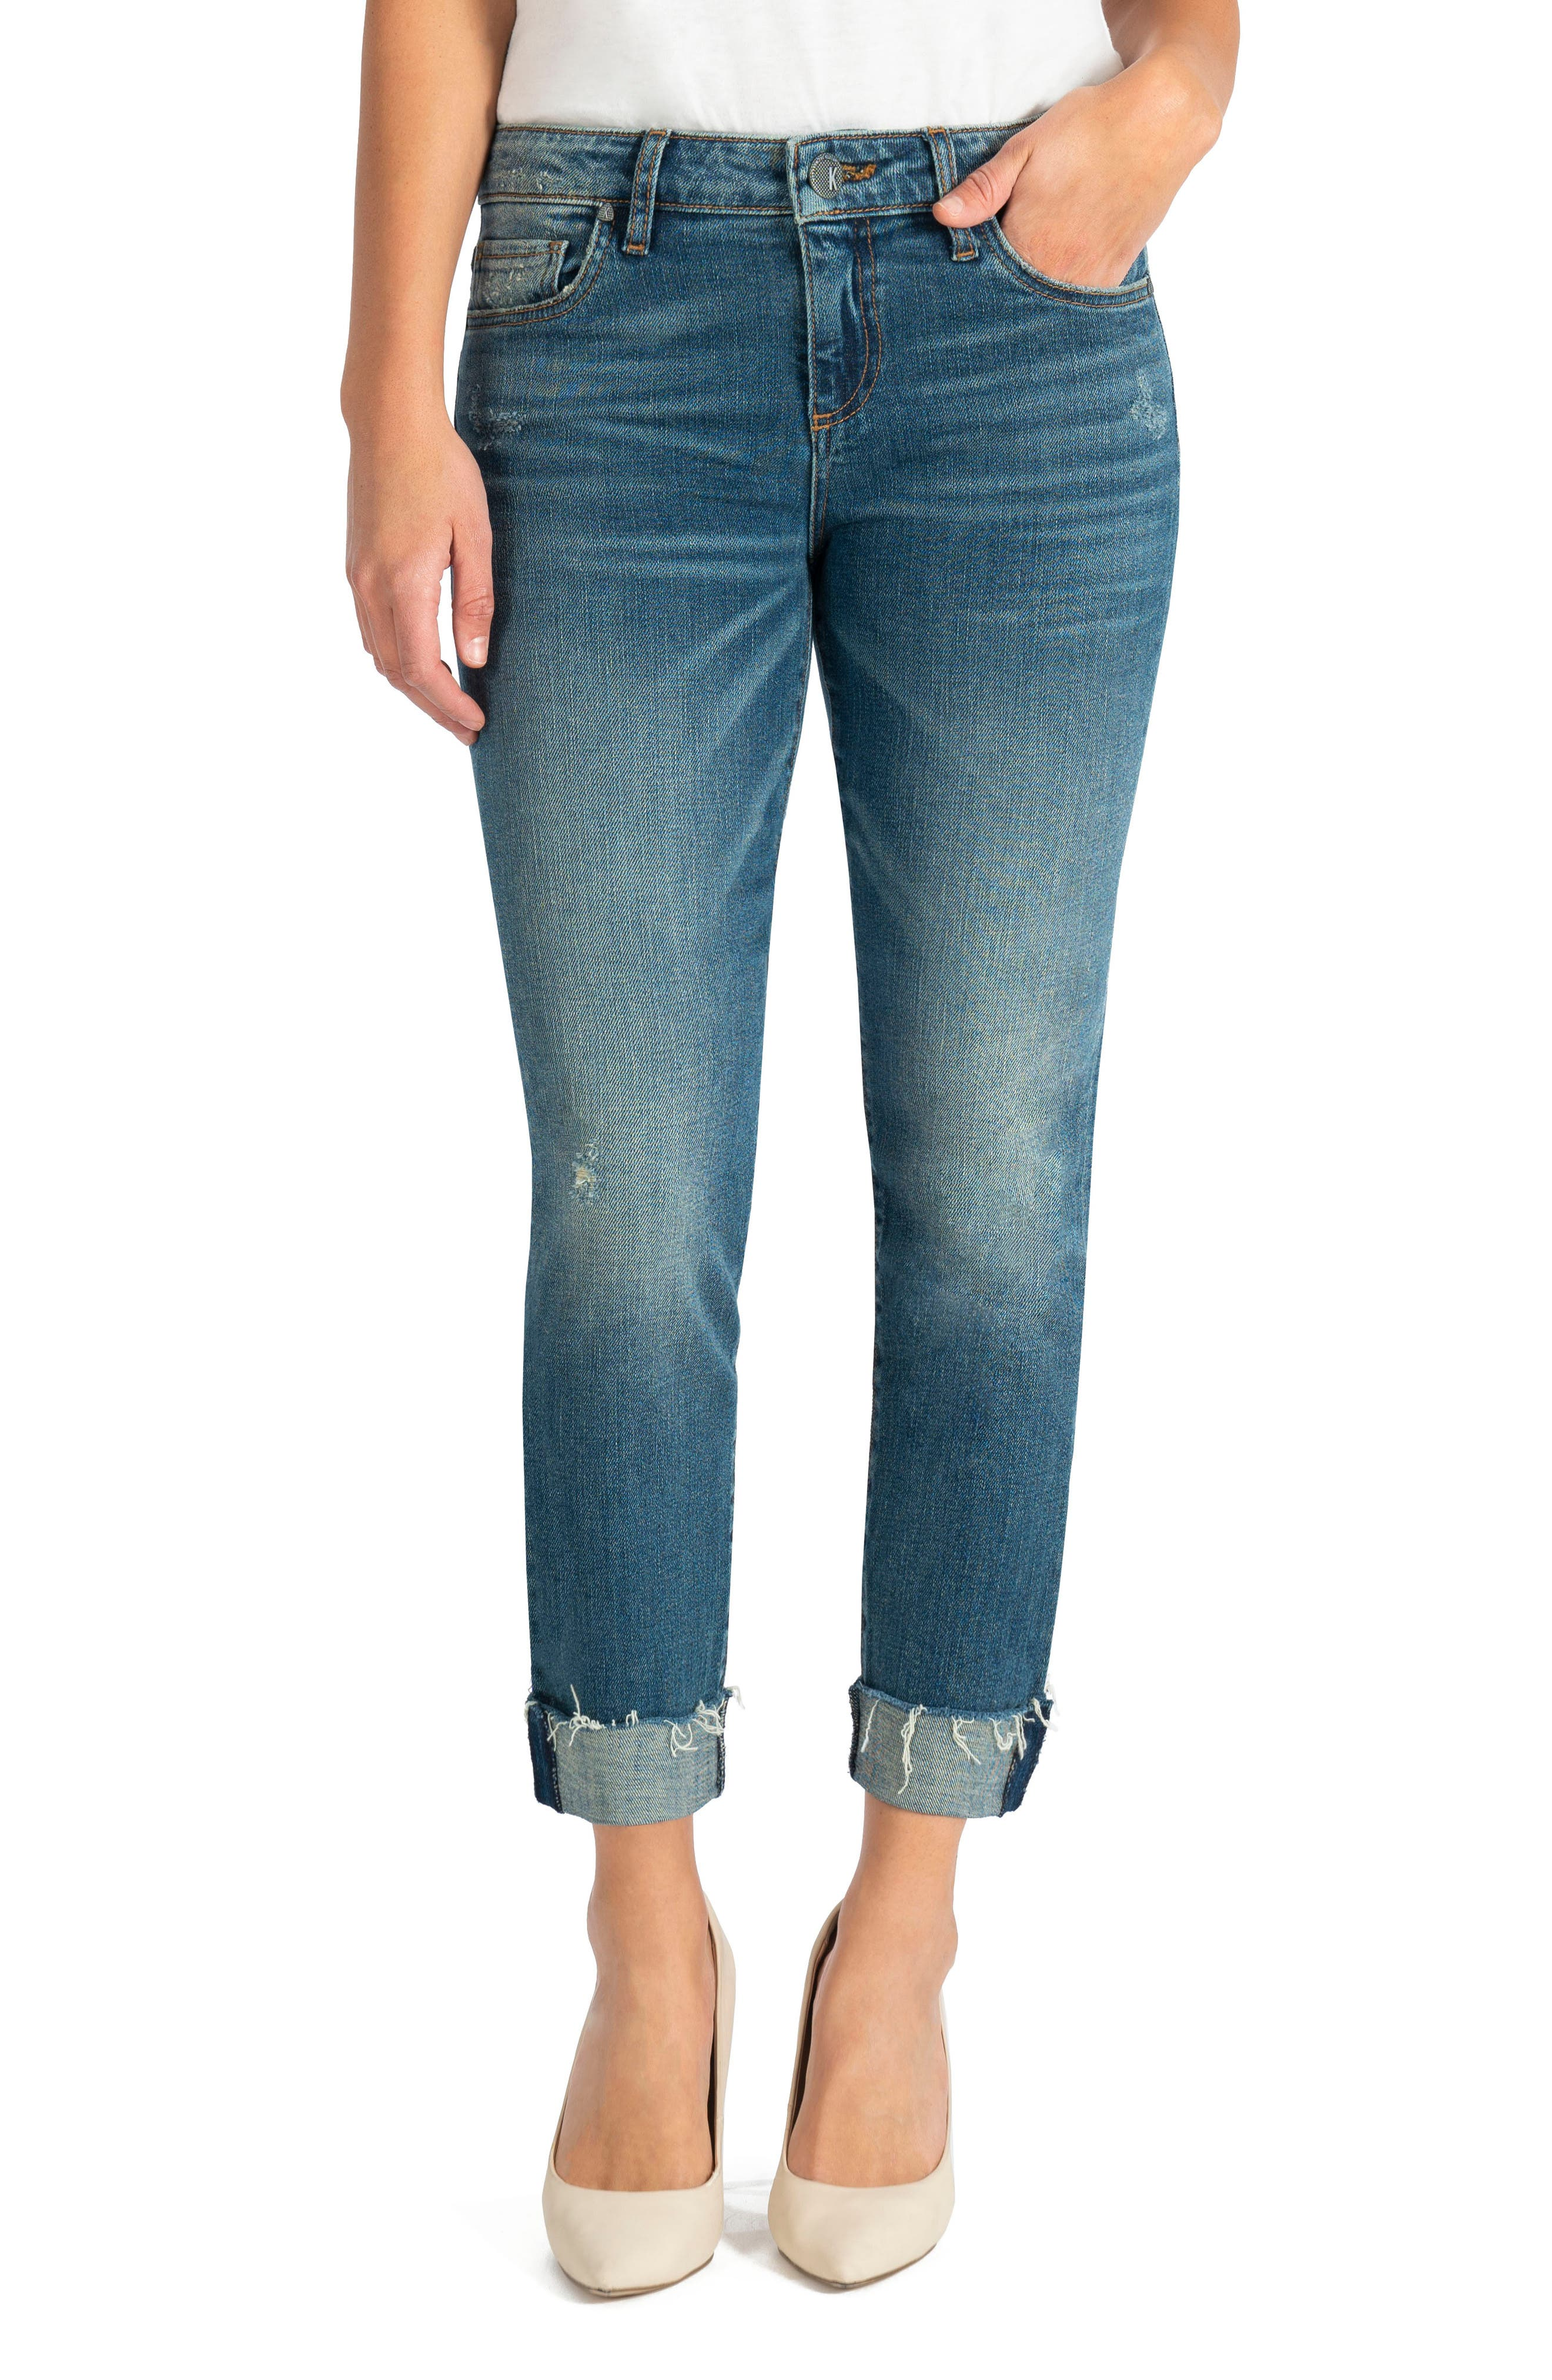 KUT from the Kloth Catherine Distressed Boyfriend Jeans (Deciding) (Regular & Petite) | Nordstrom